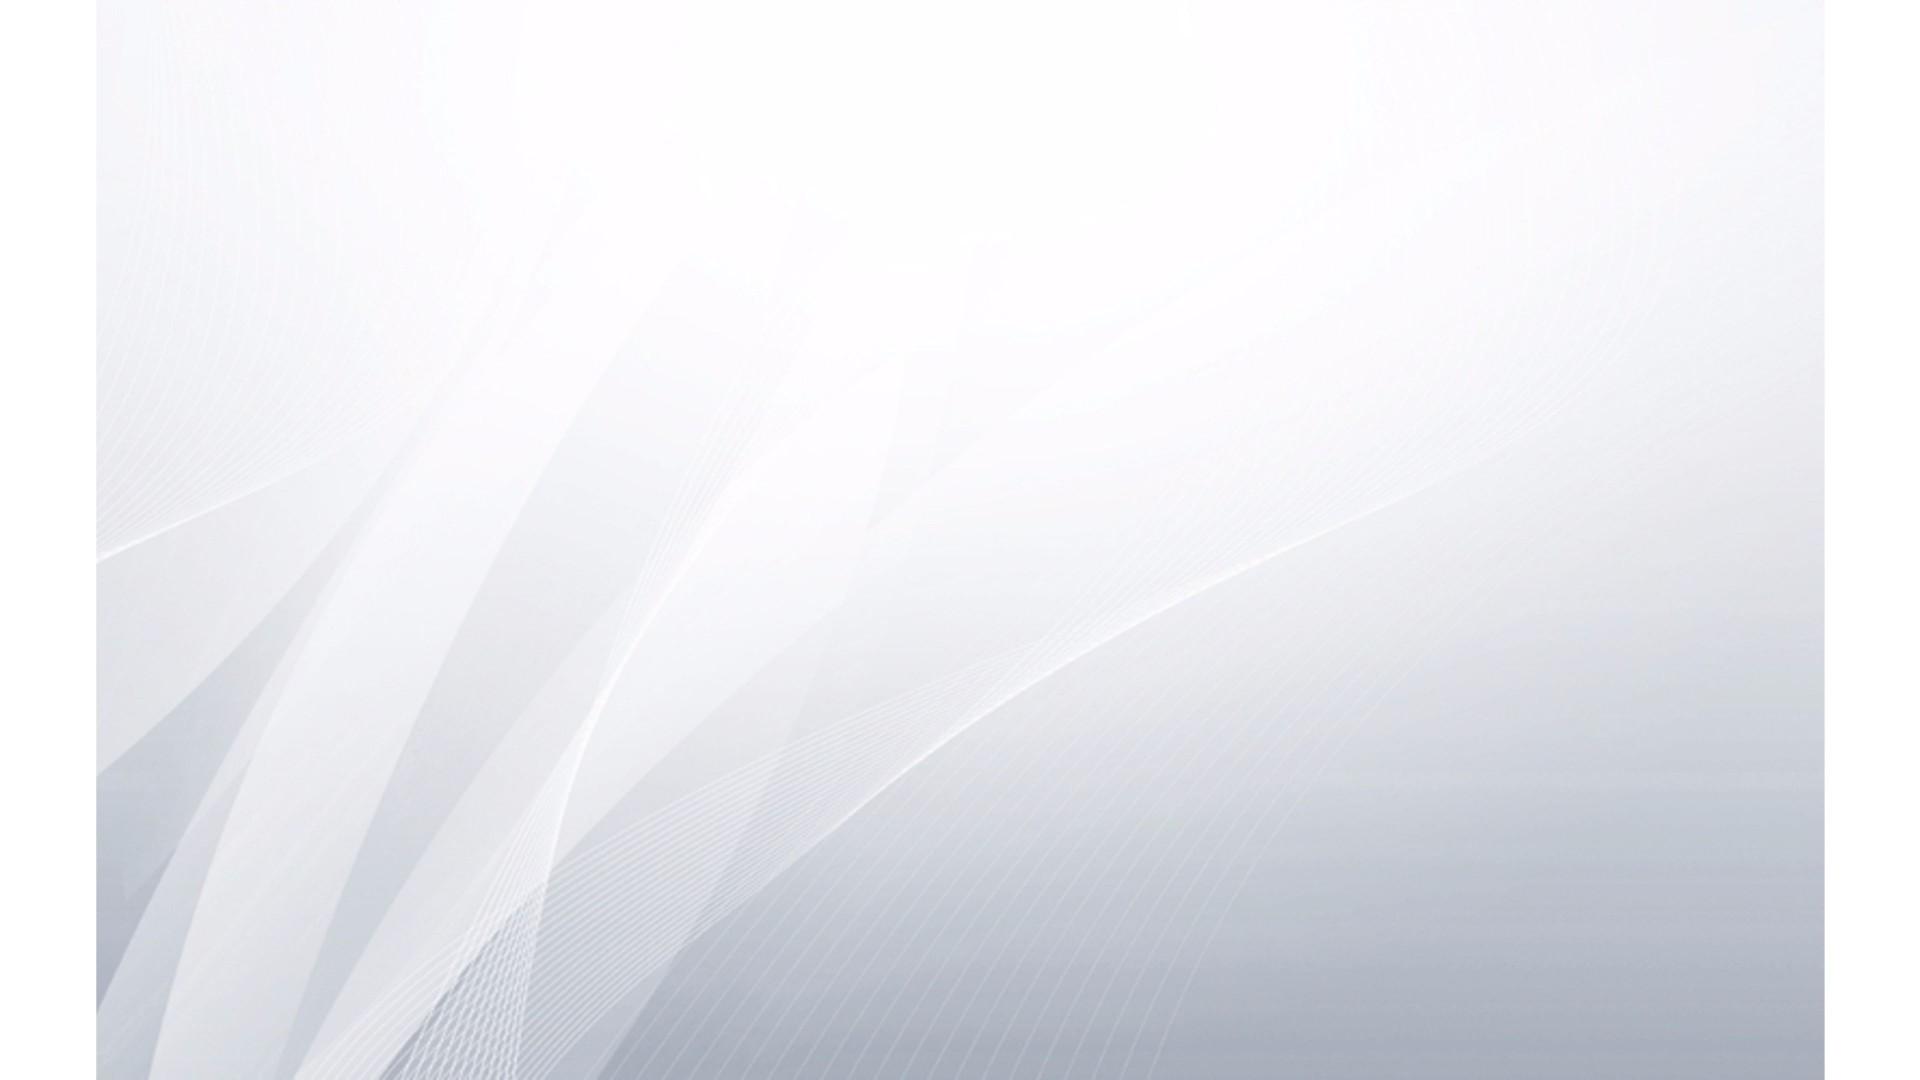 Free Download White Noise Abstract 4k Wallpaper 4k Wallpaper